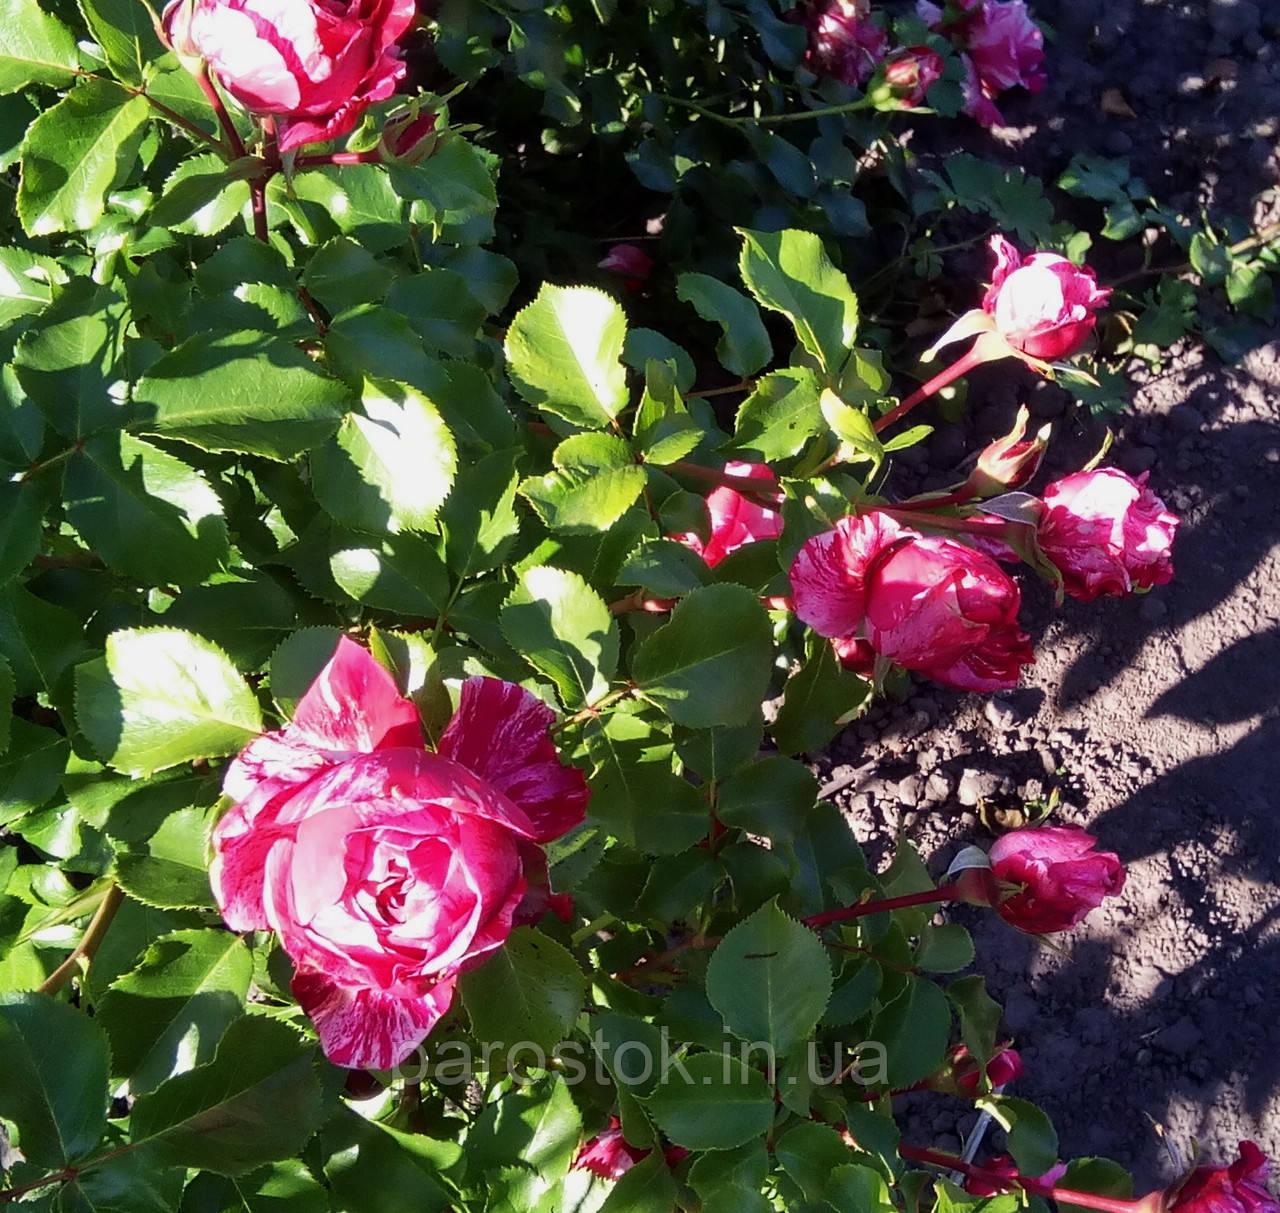 Роза Инес Састр. Плетистая роза.